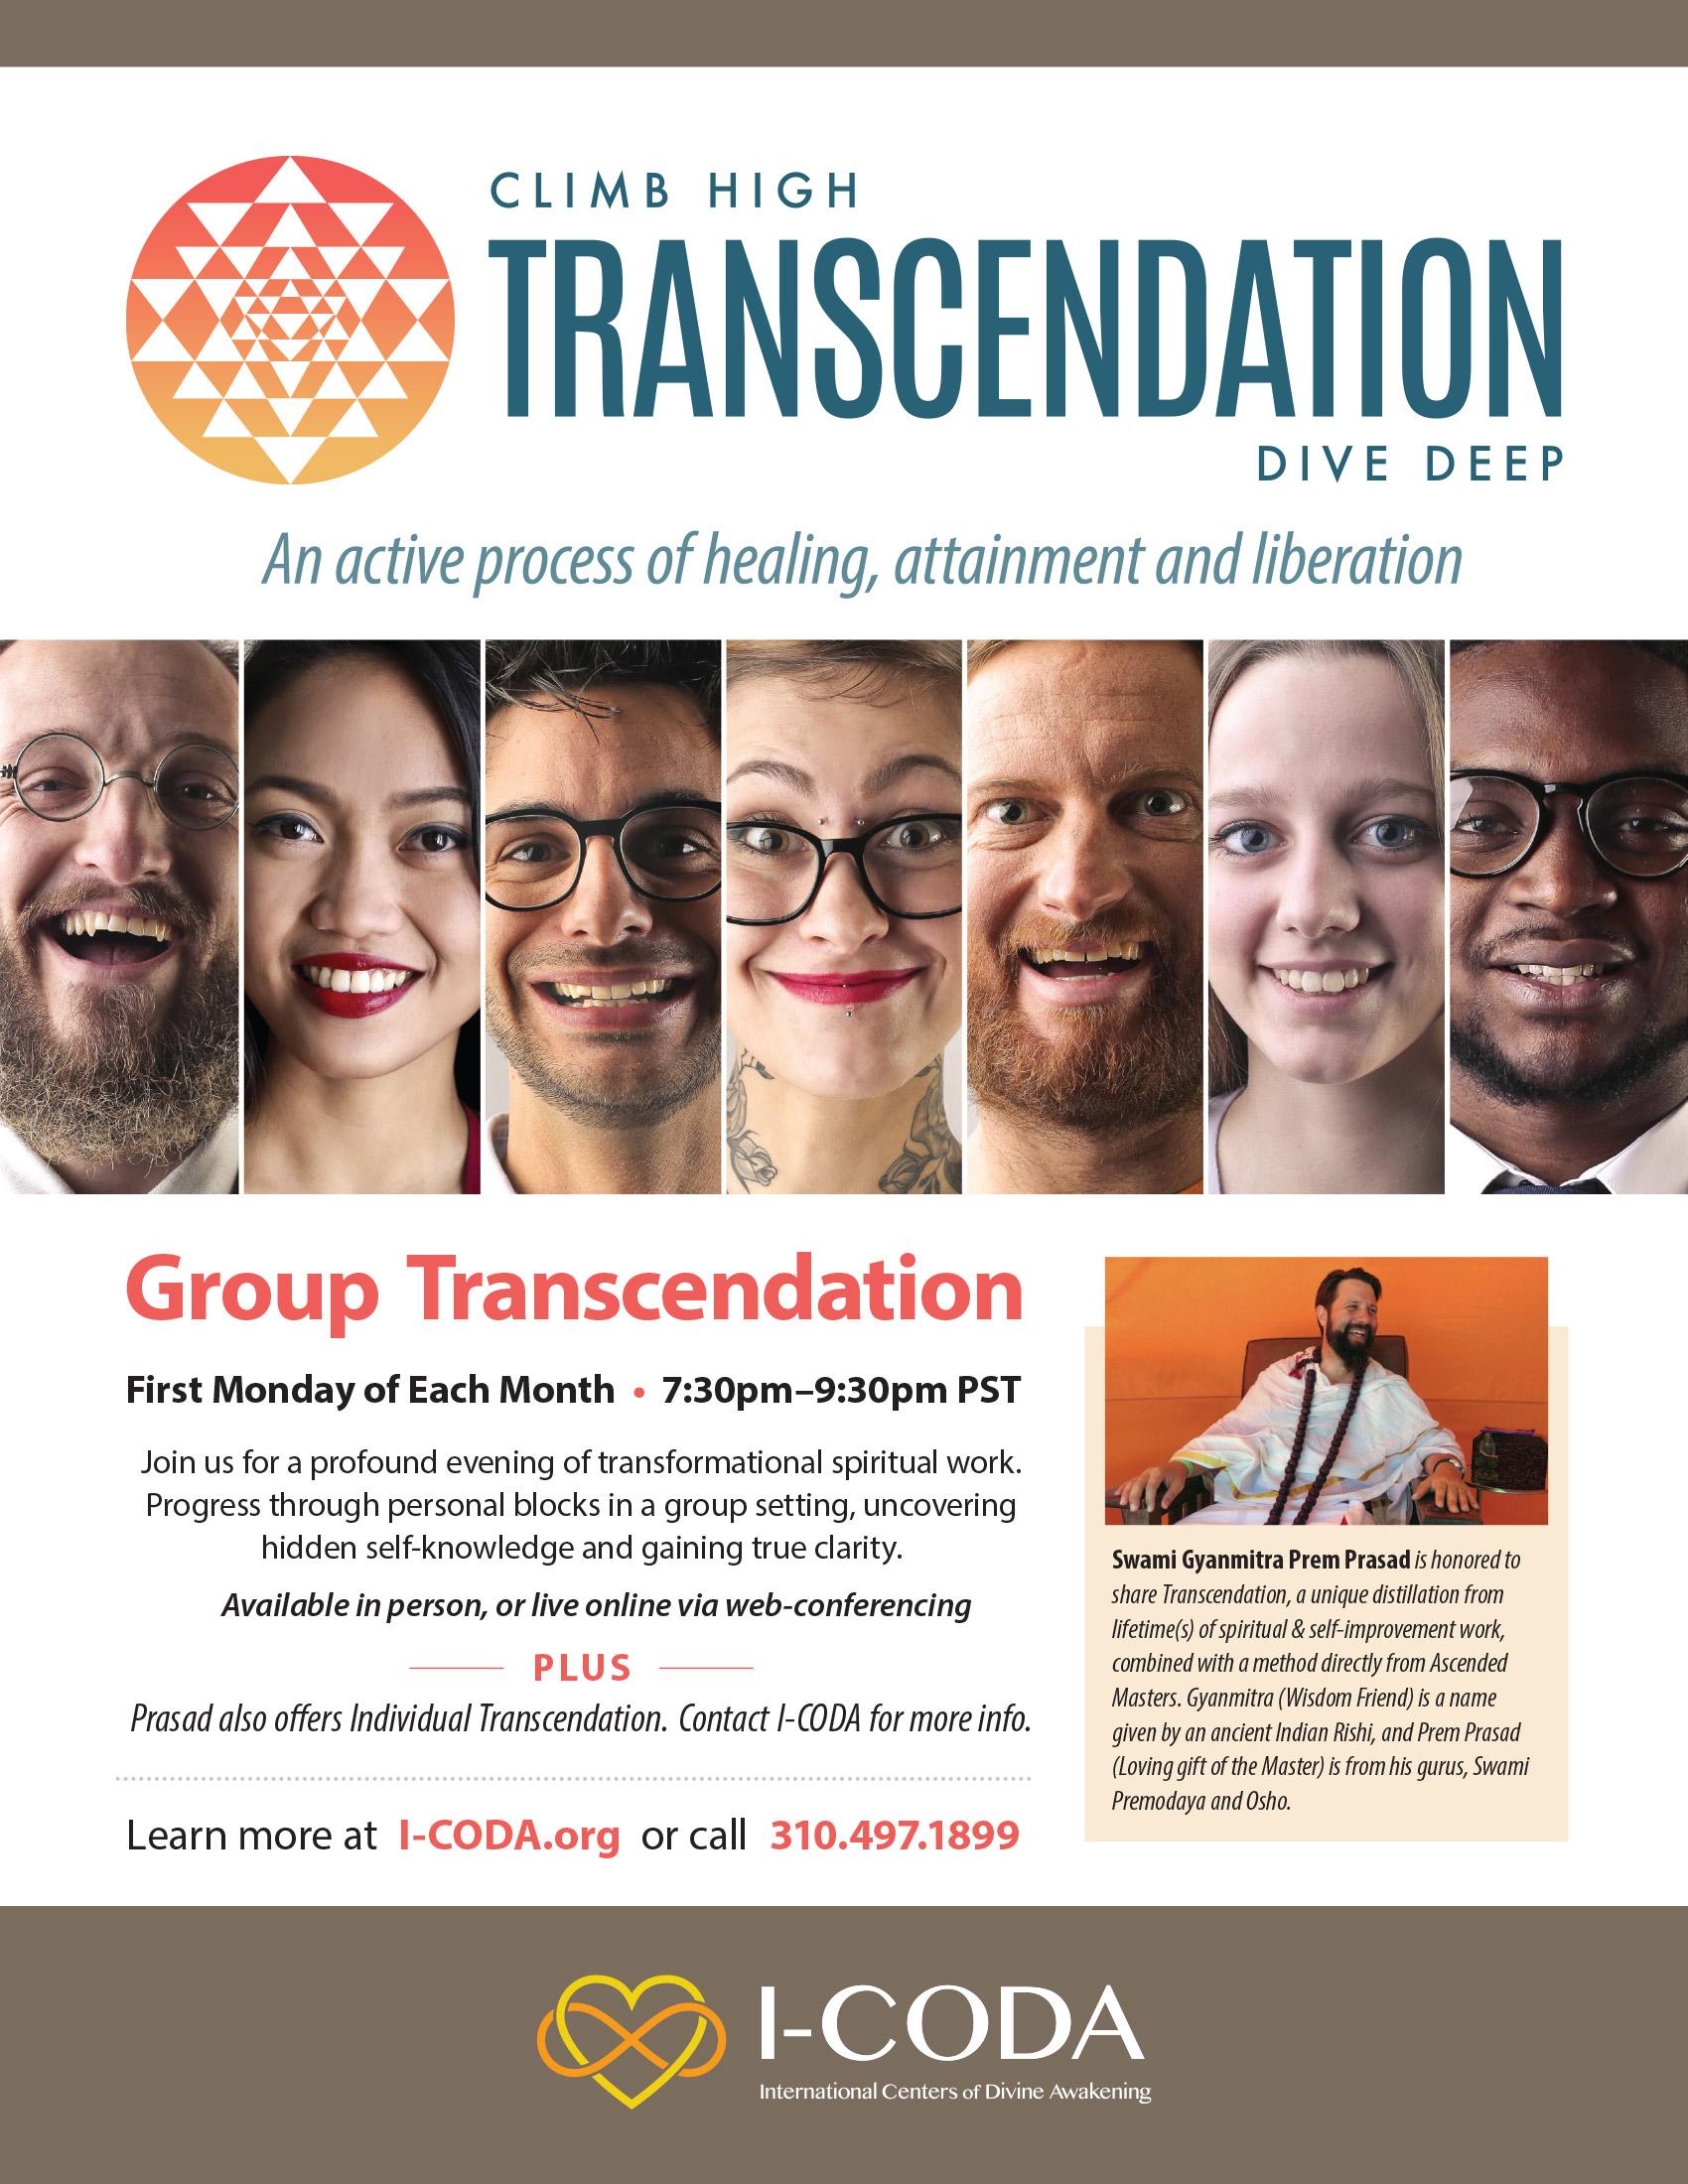 Transcendation-Flyer-011718.jpg